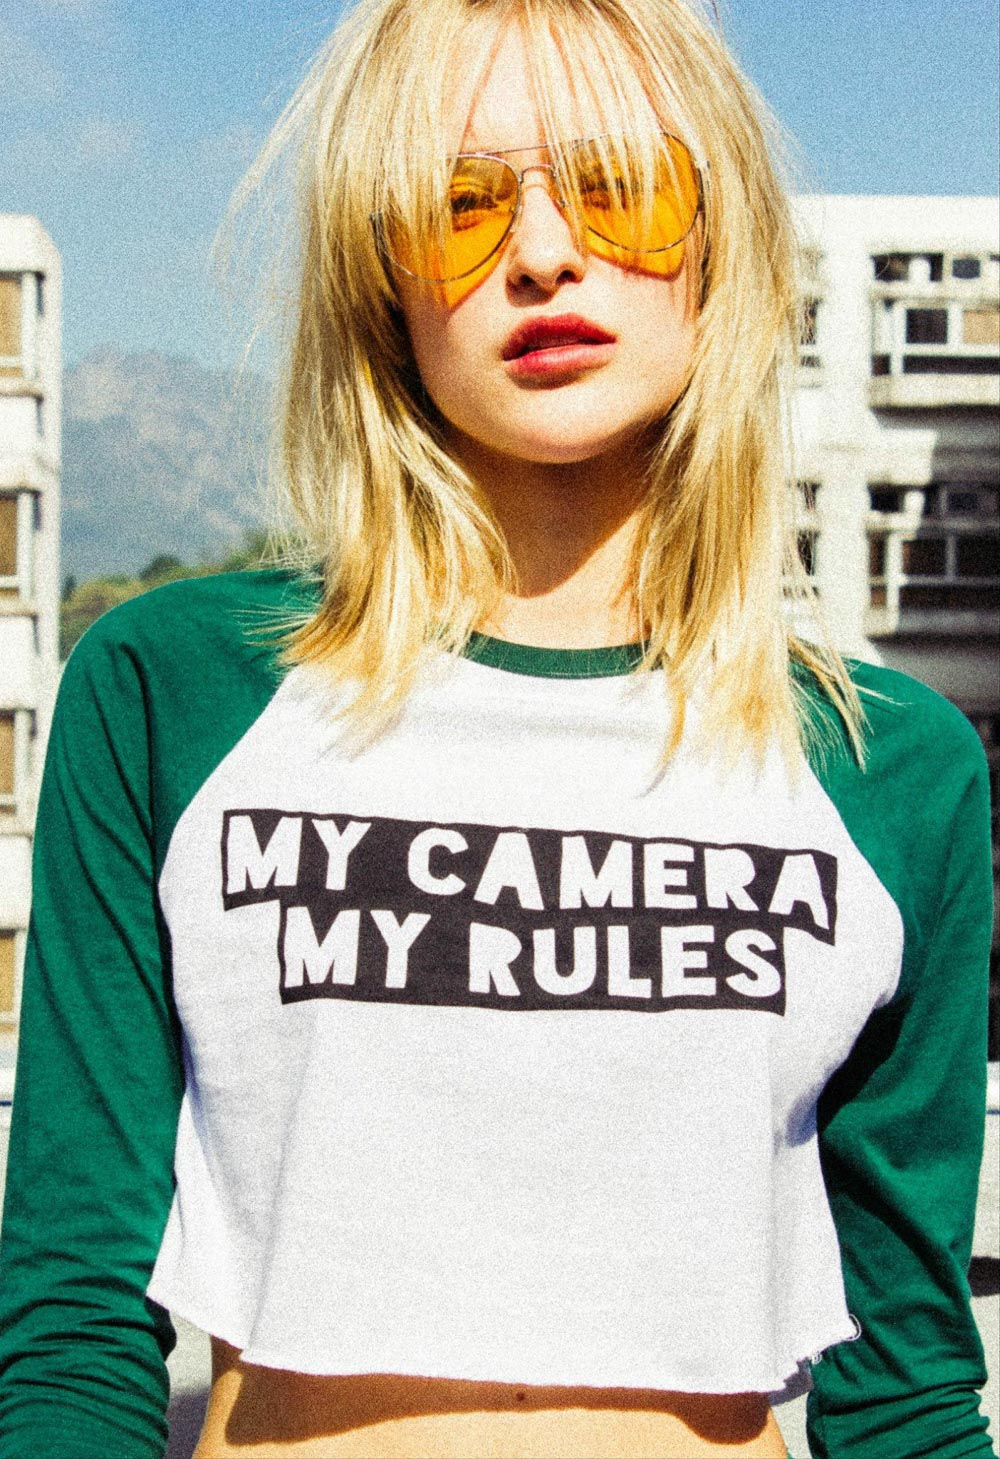 My camera my rules